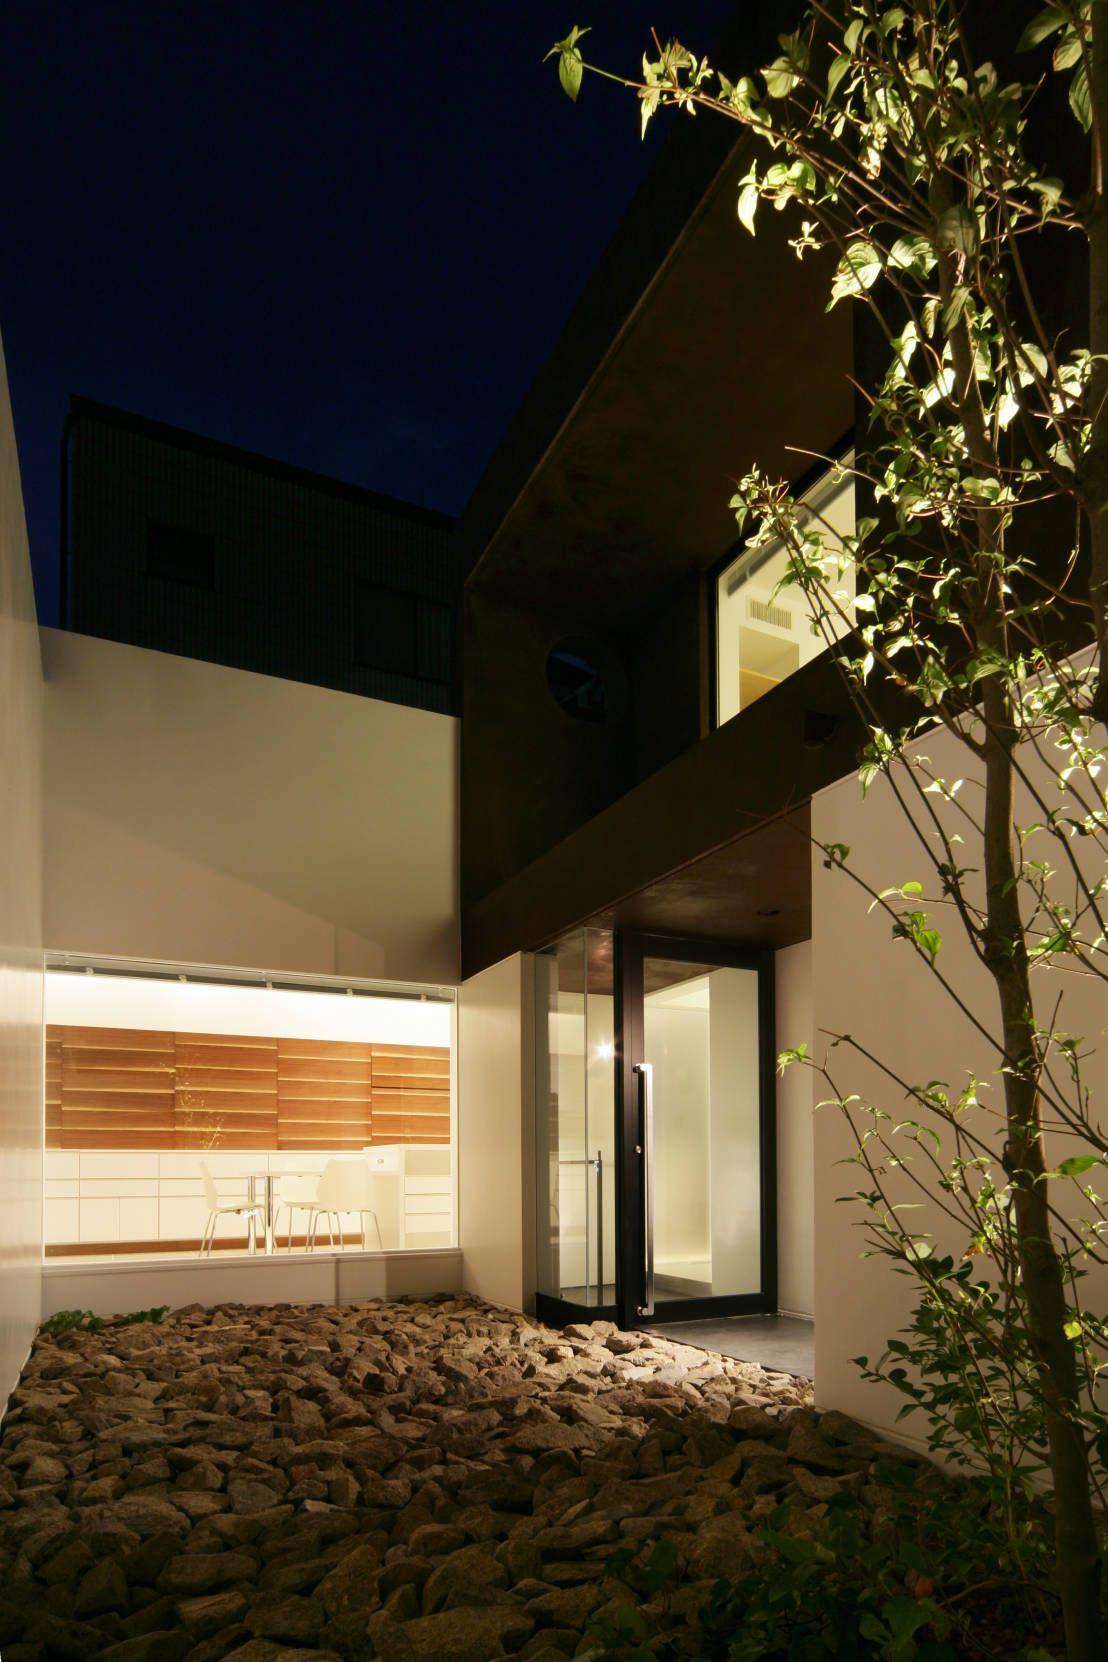 Den Nen Architecture の モダンな 庭 House in Ako